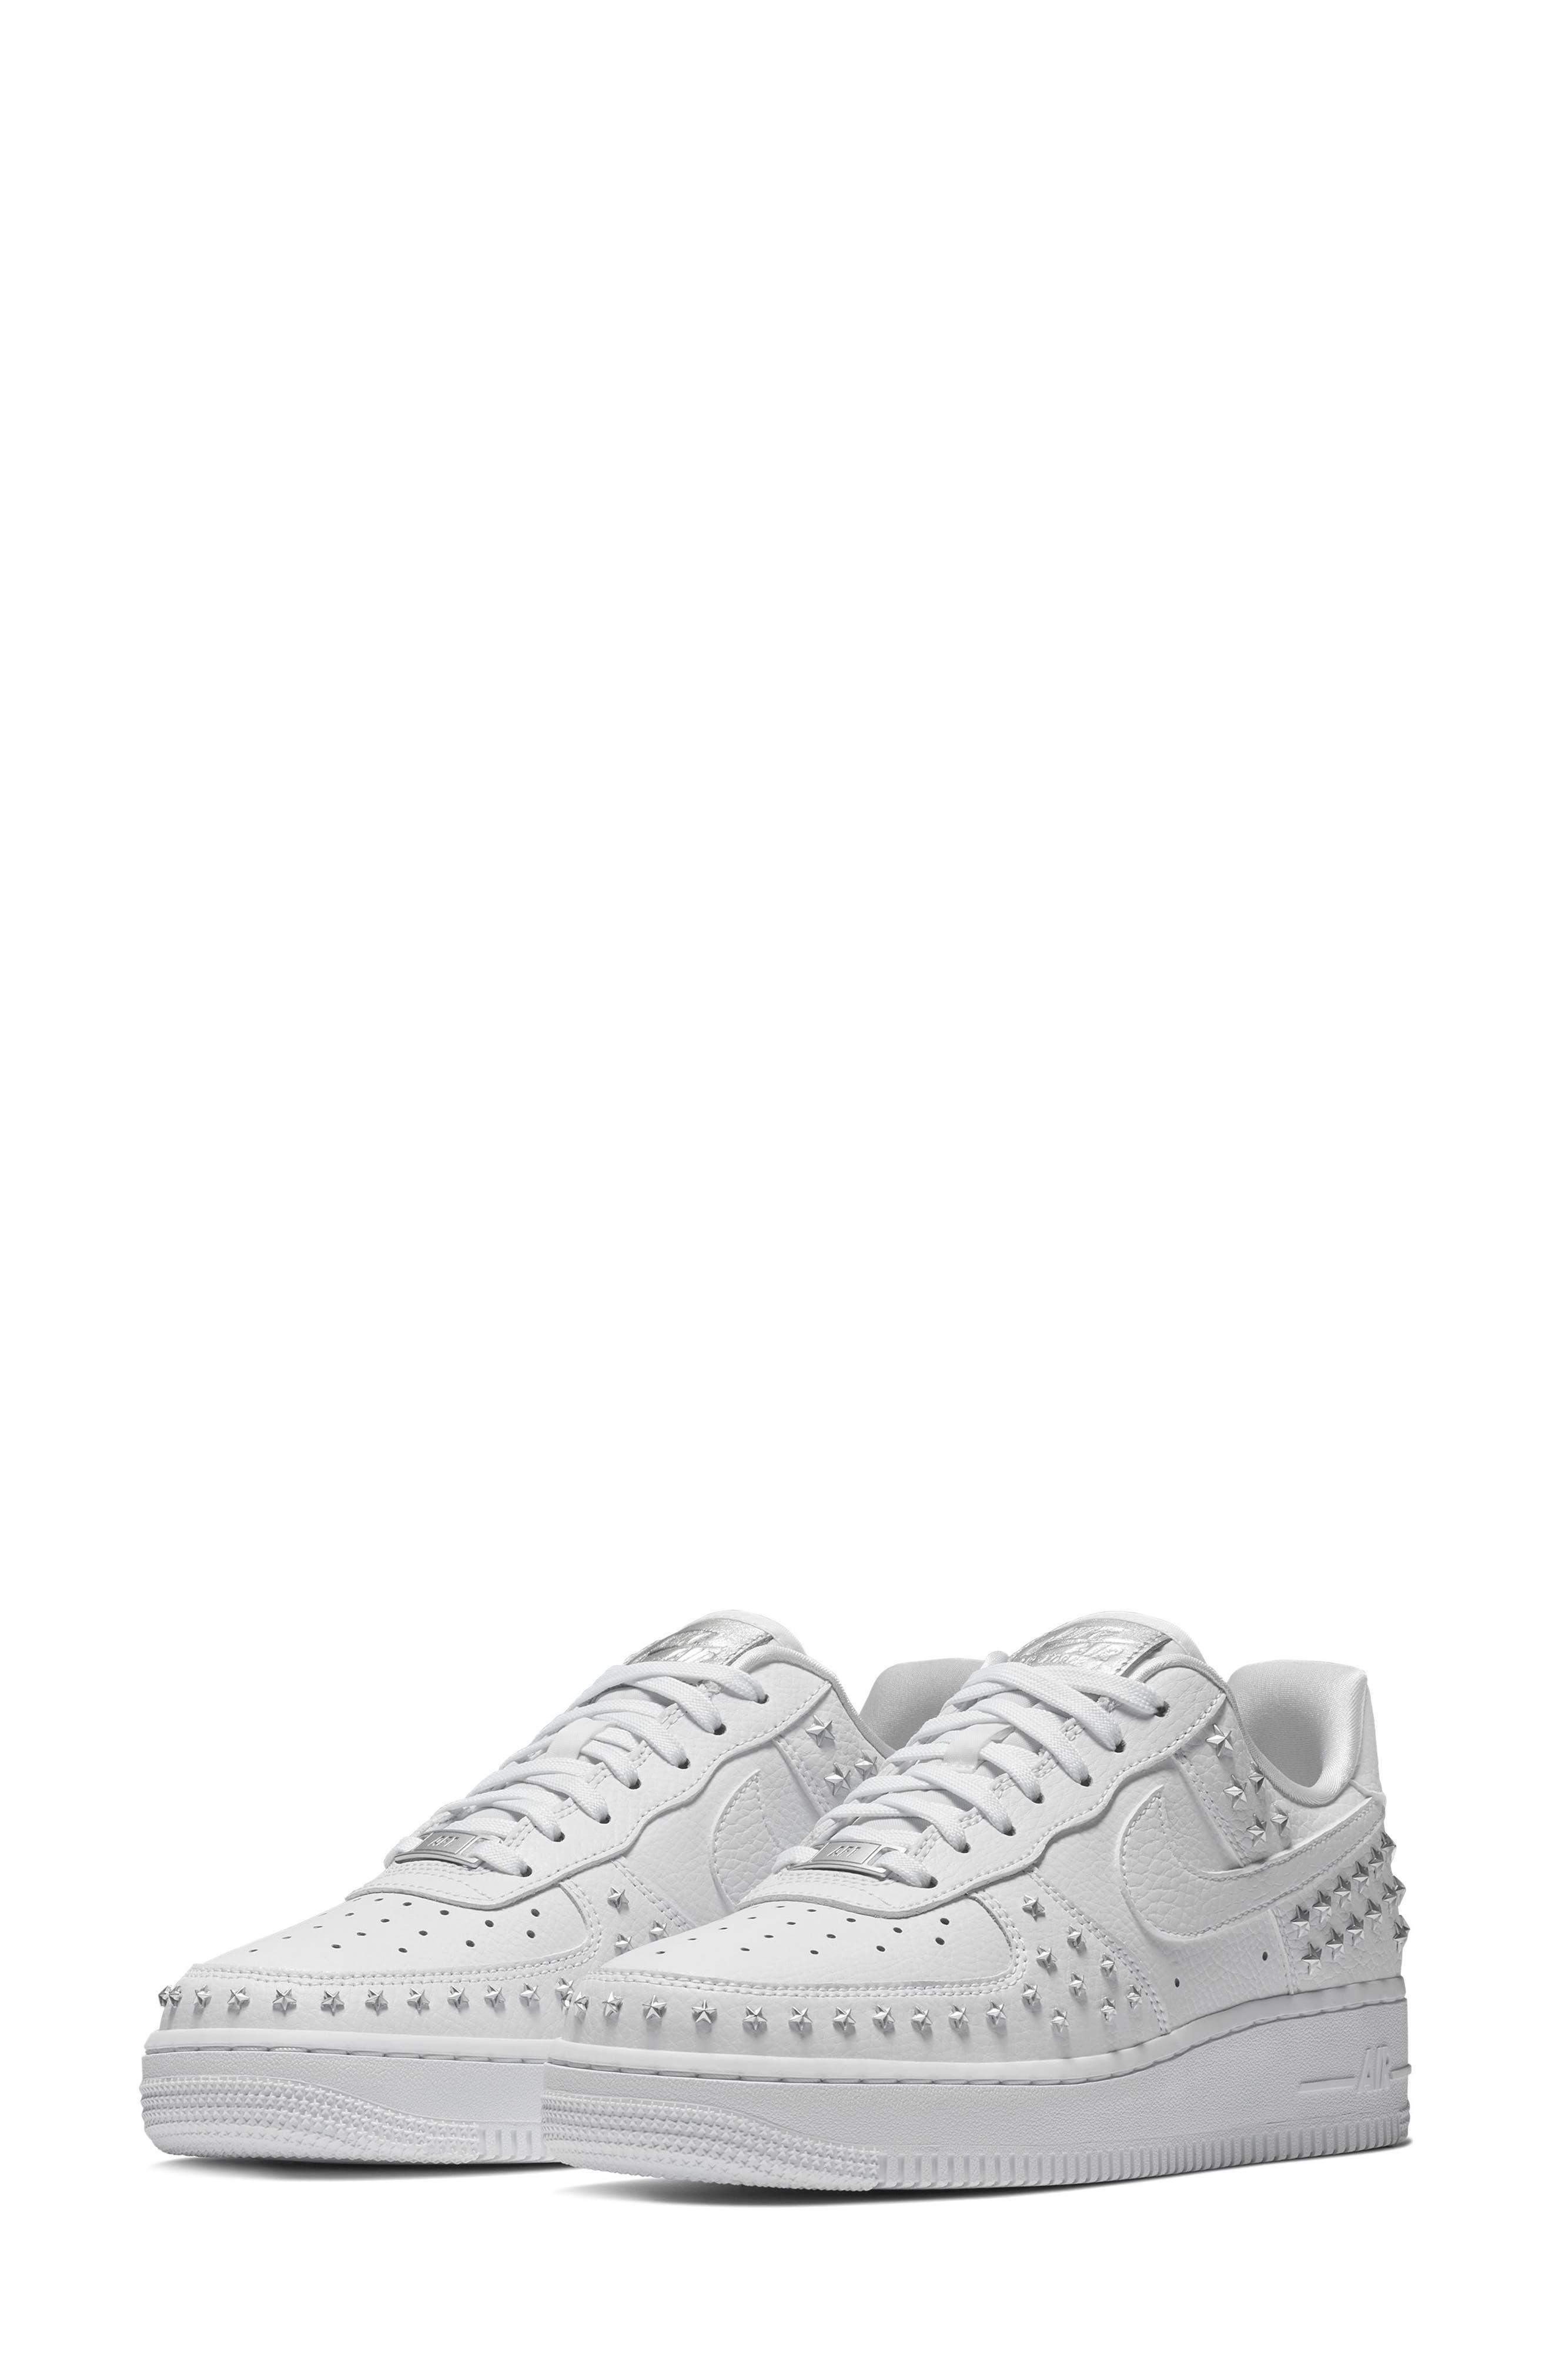 Air Force 1 '07 XX Sneaker,                         Main,                         color, WHITE/ WHITE/ WHITE